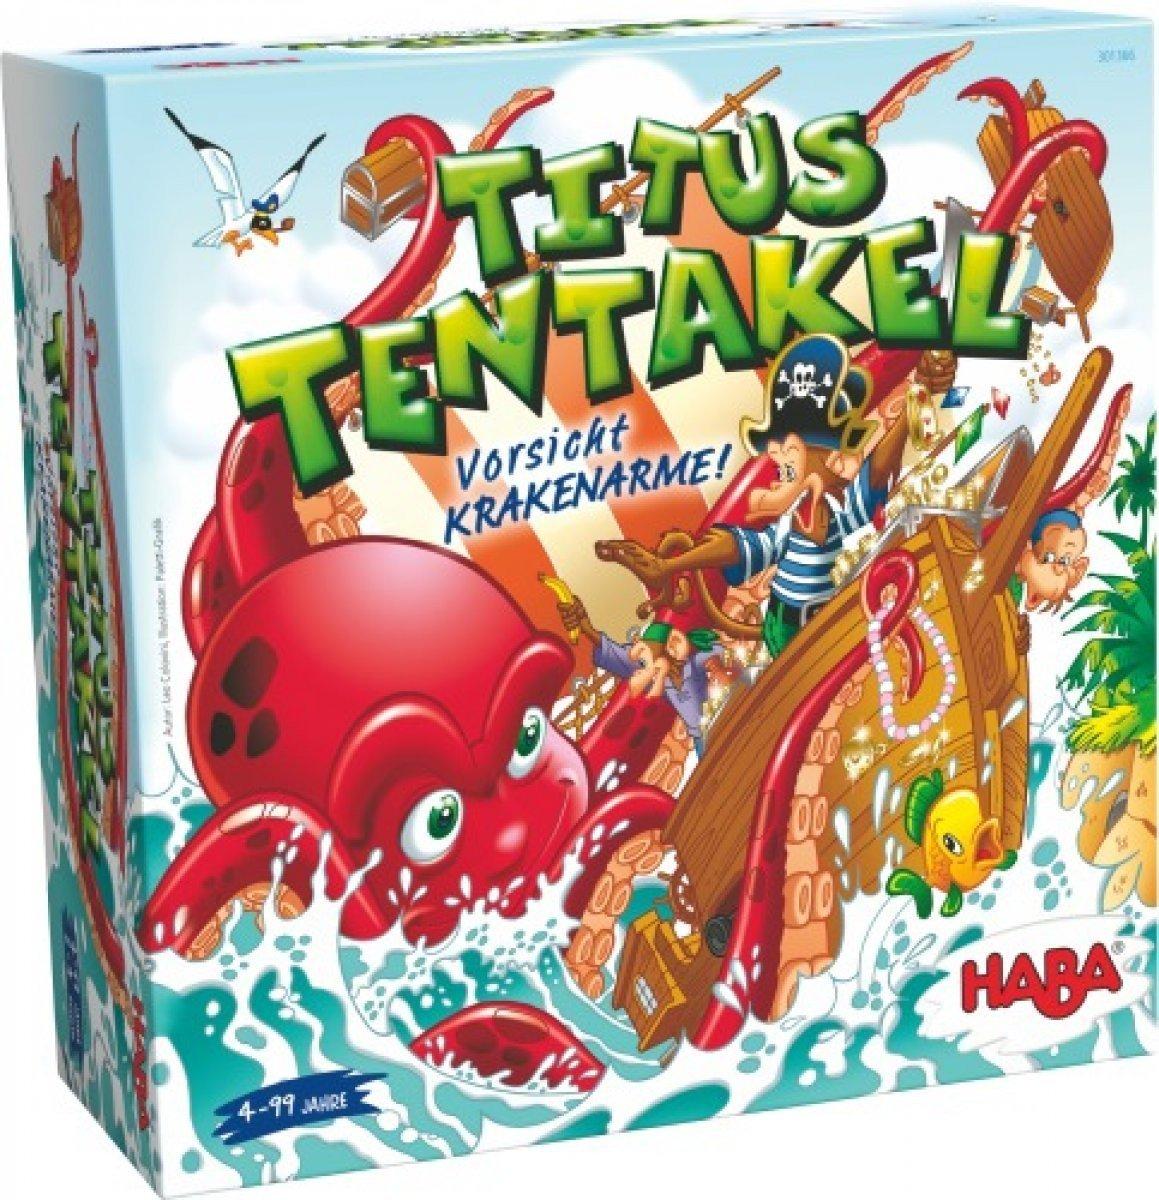 Amazon - Titus Tentakel von HABA um 15,59 €( Preisvergleich 22,98 €)